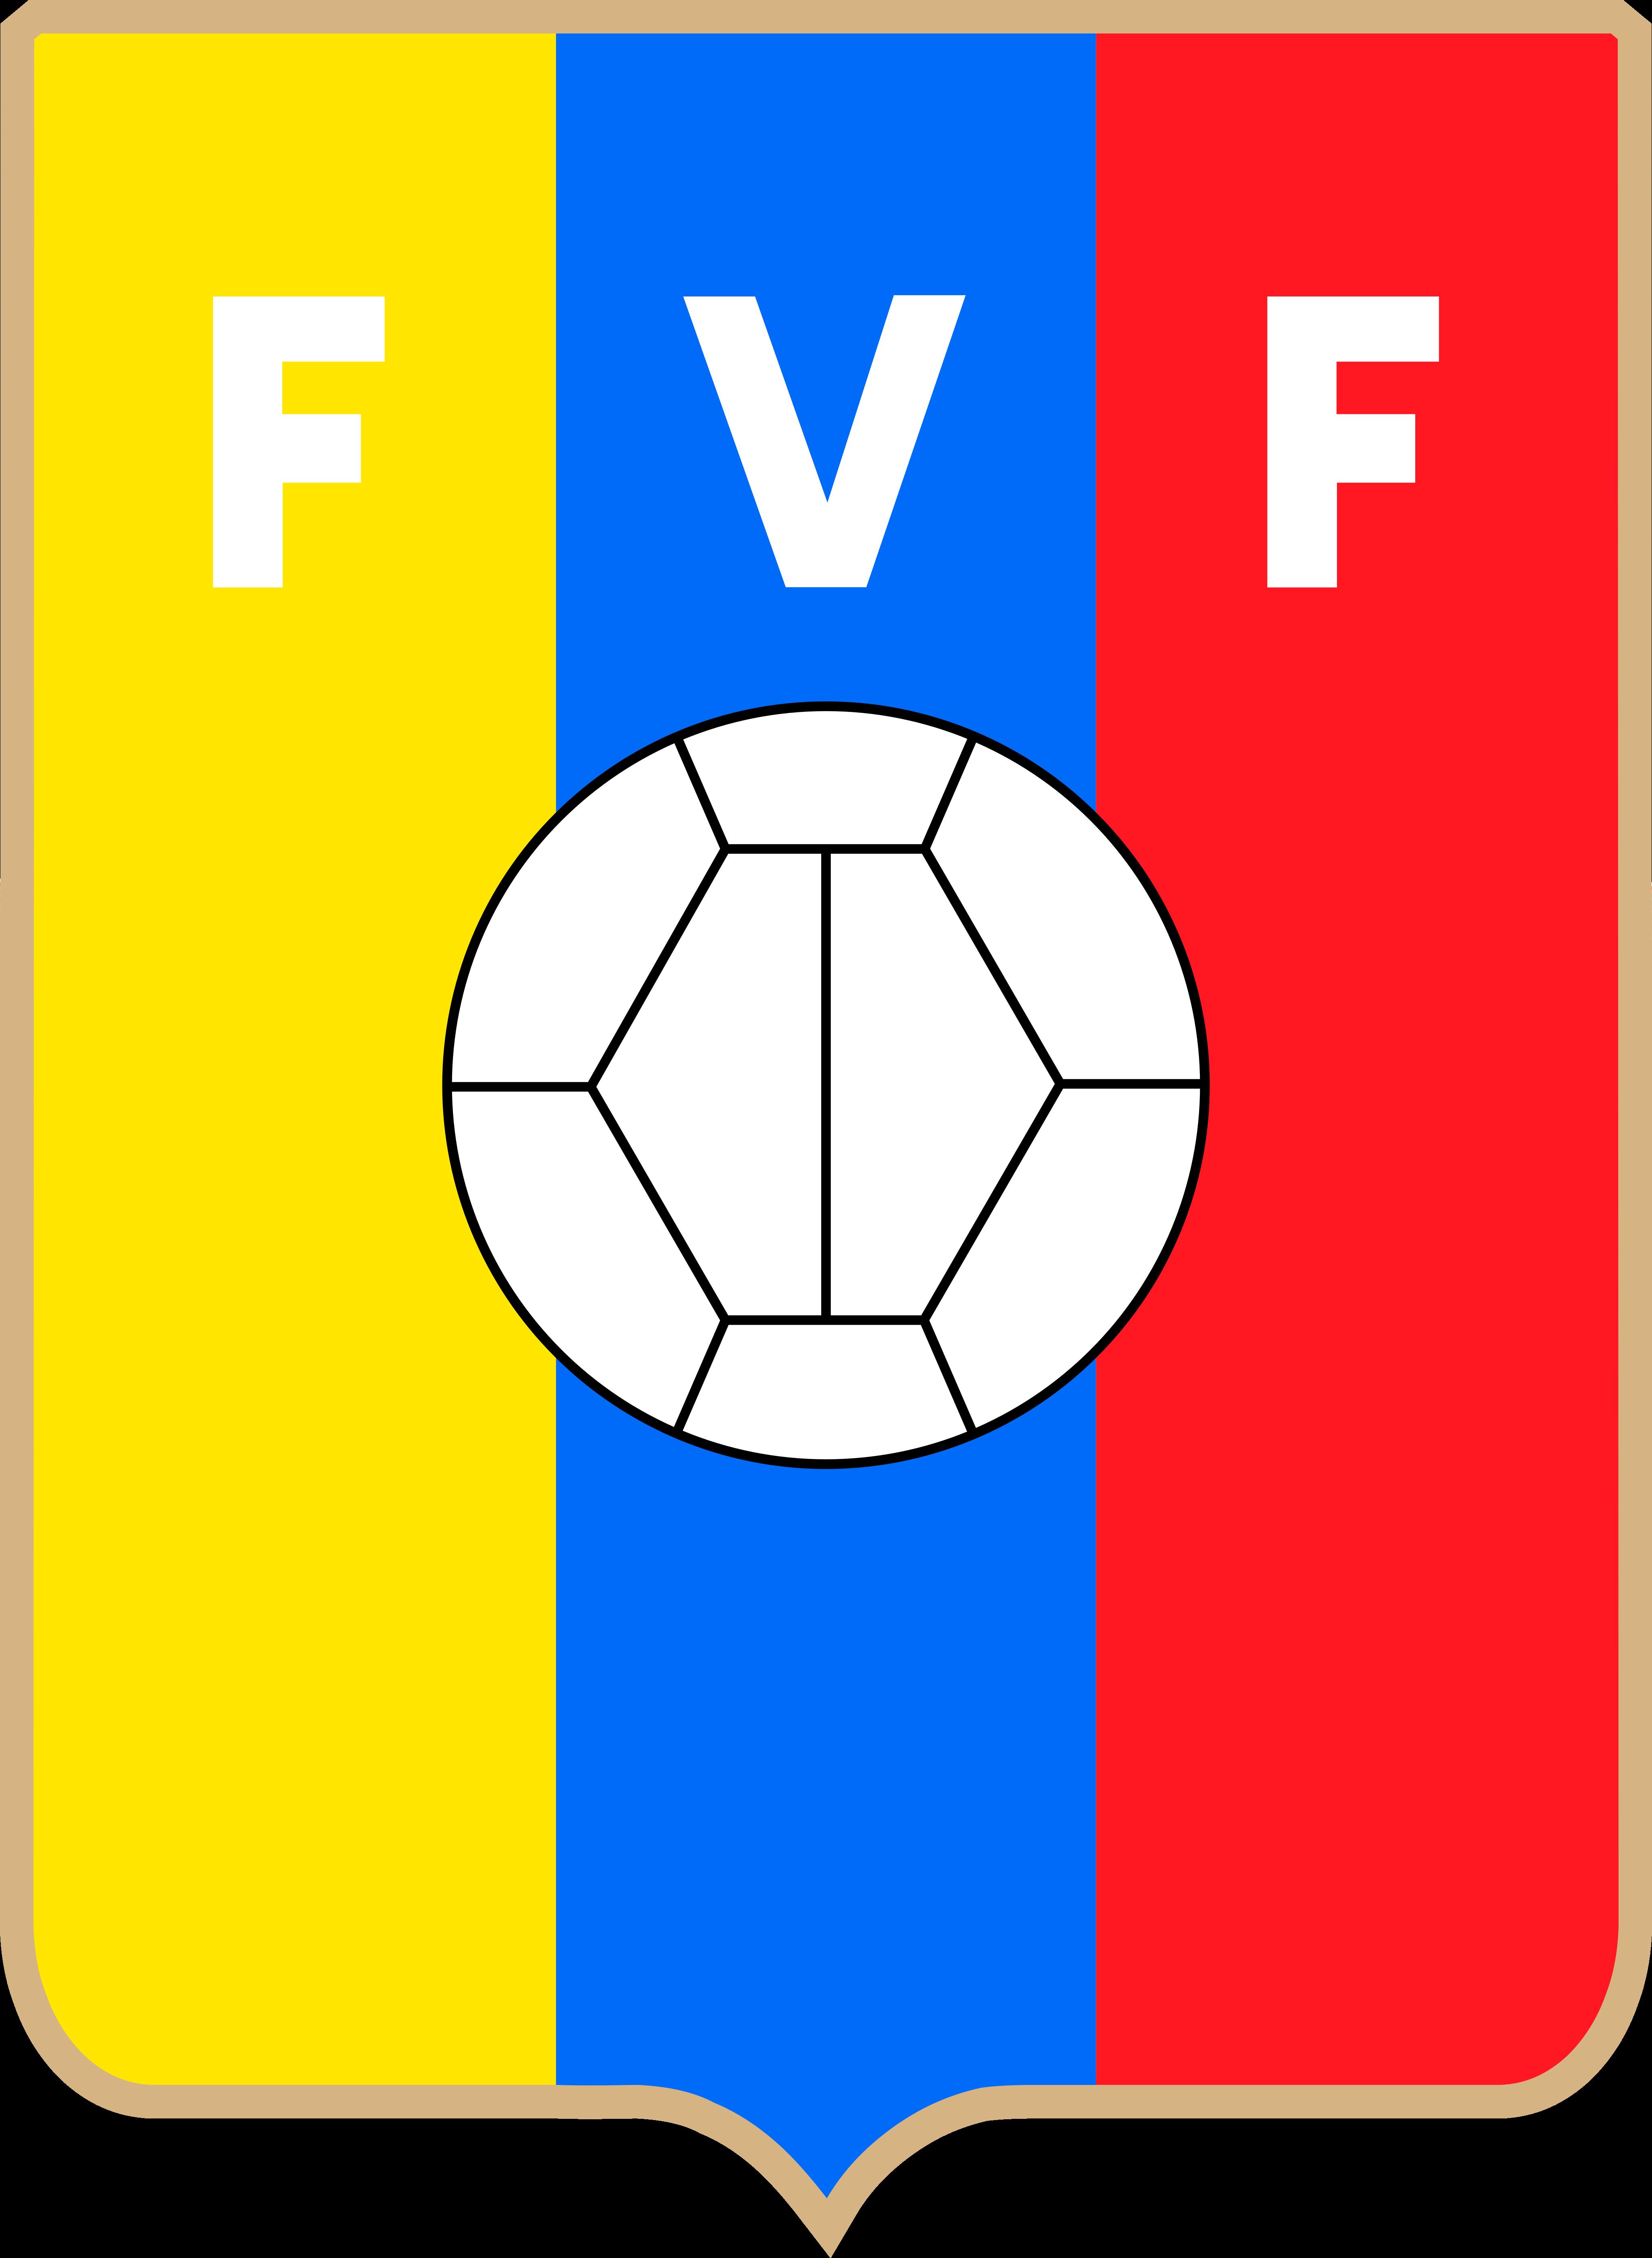 fvf seleccion de futbol de venezuela logo - FVF Logo - Selección de fútbol de Venezuela Logo